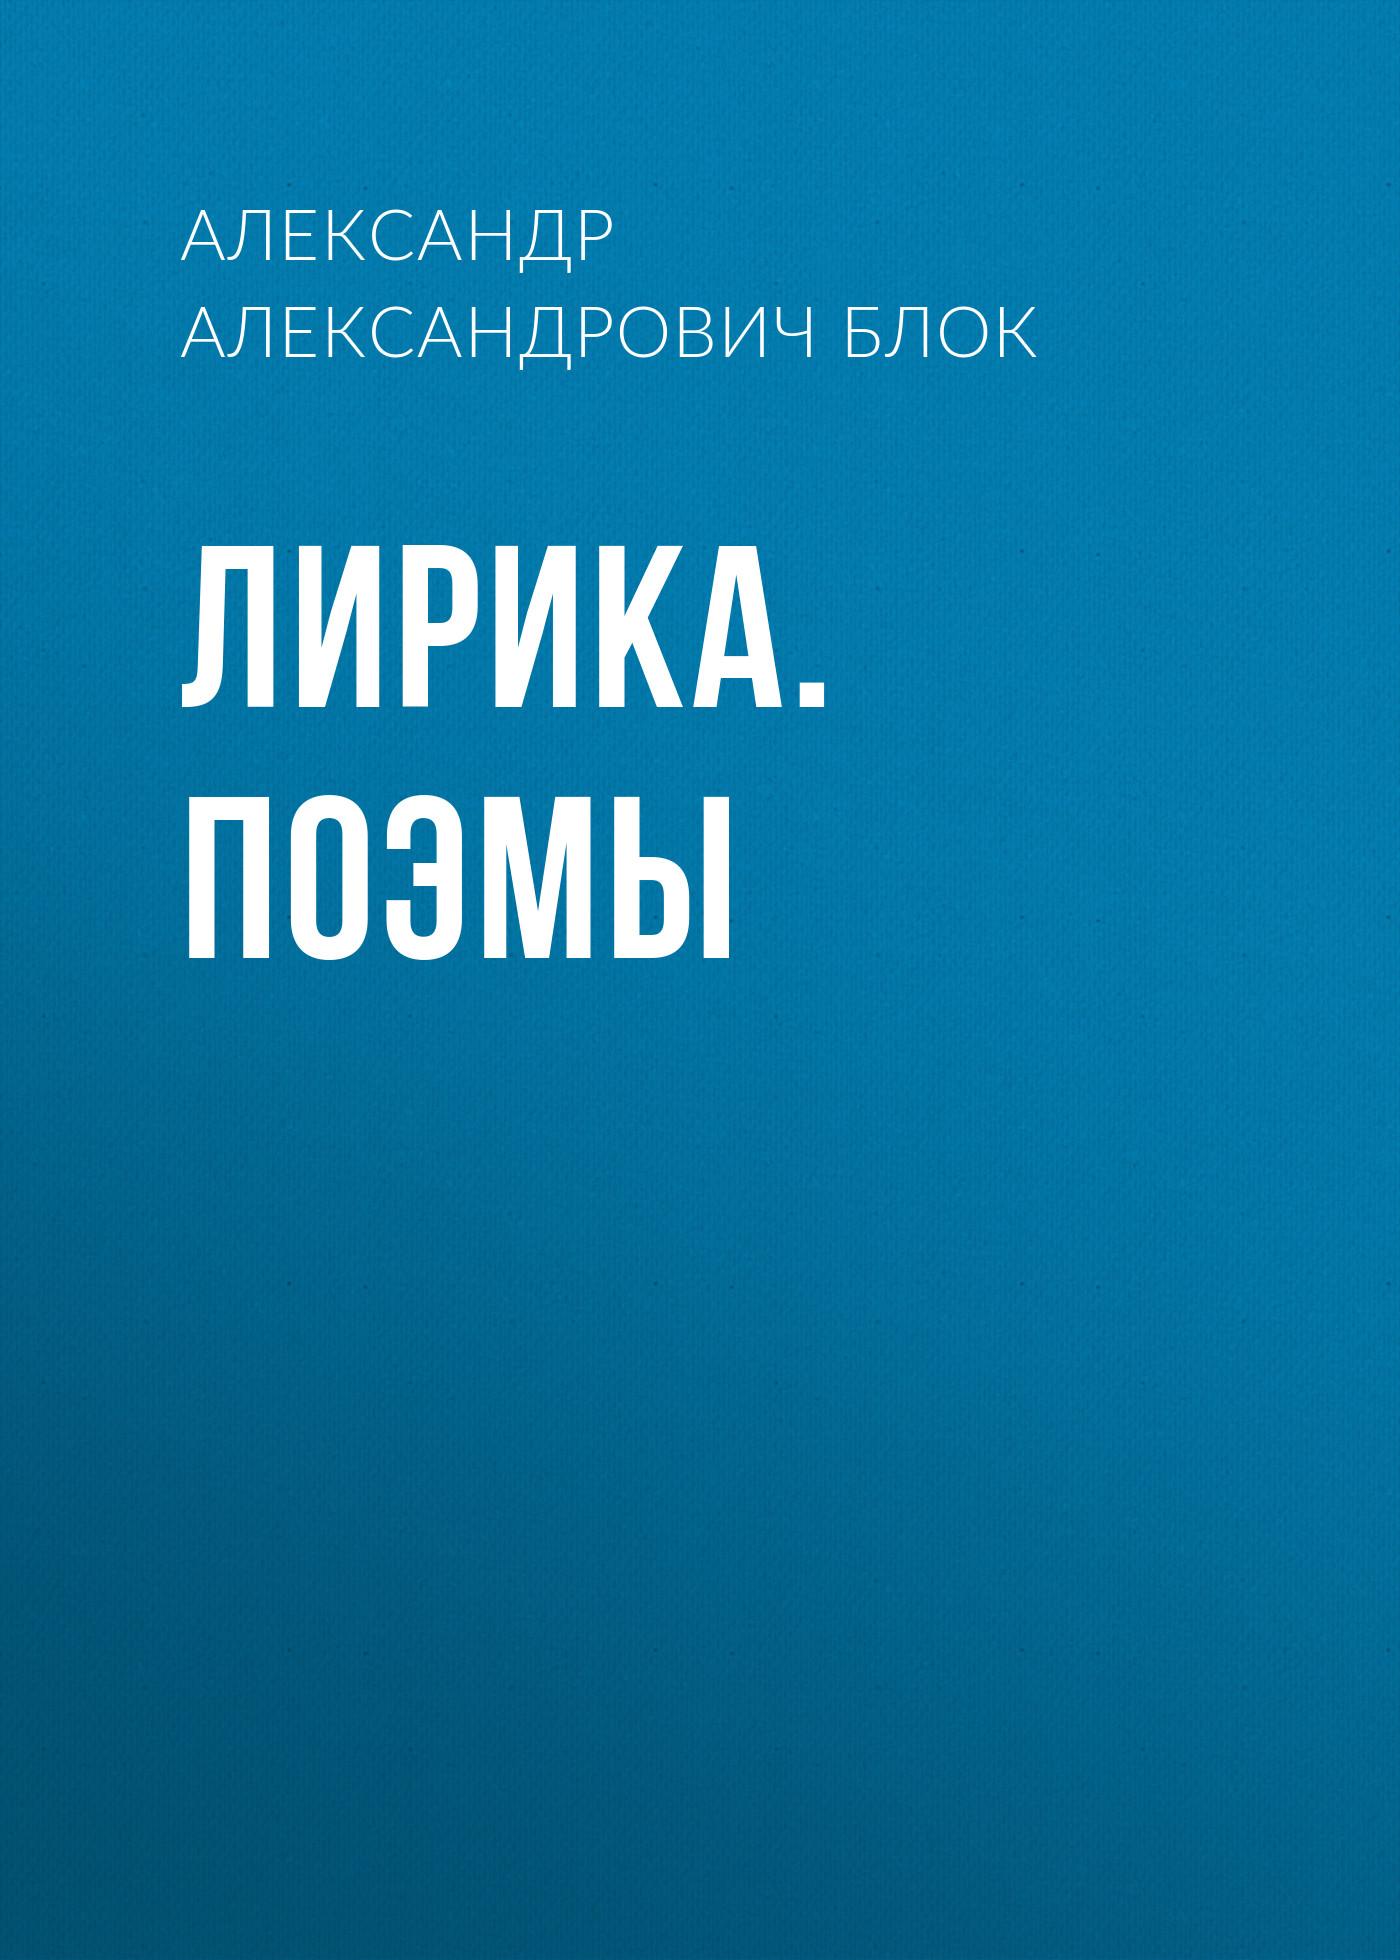 Александр Блок Лирика. Поэмы александр блок стихотворения